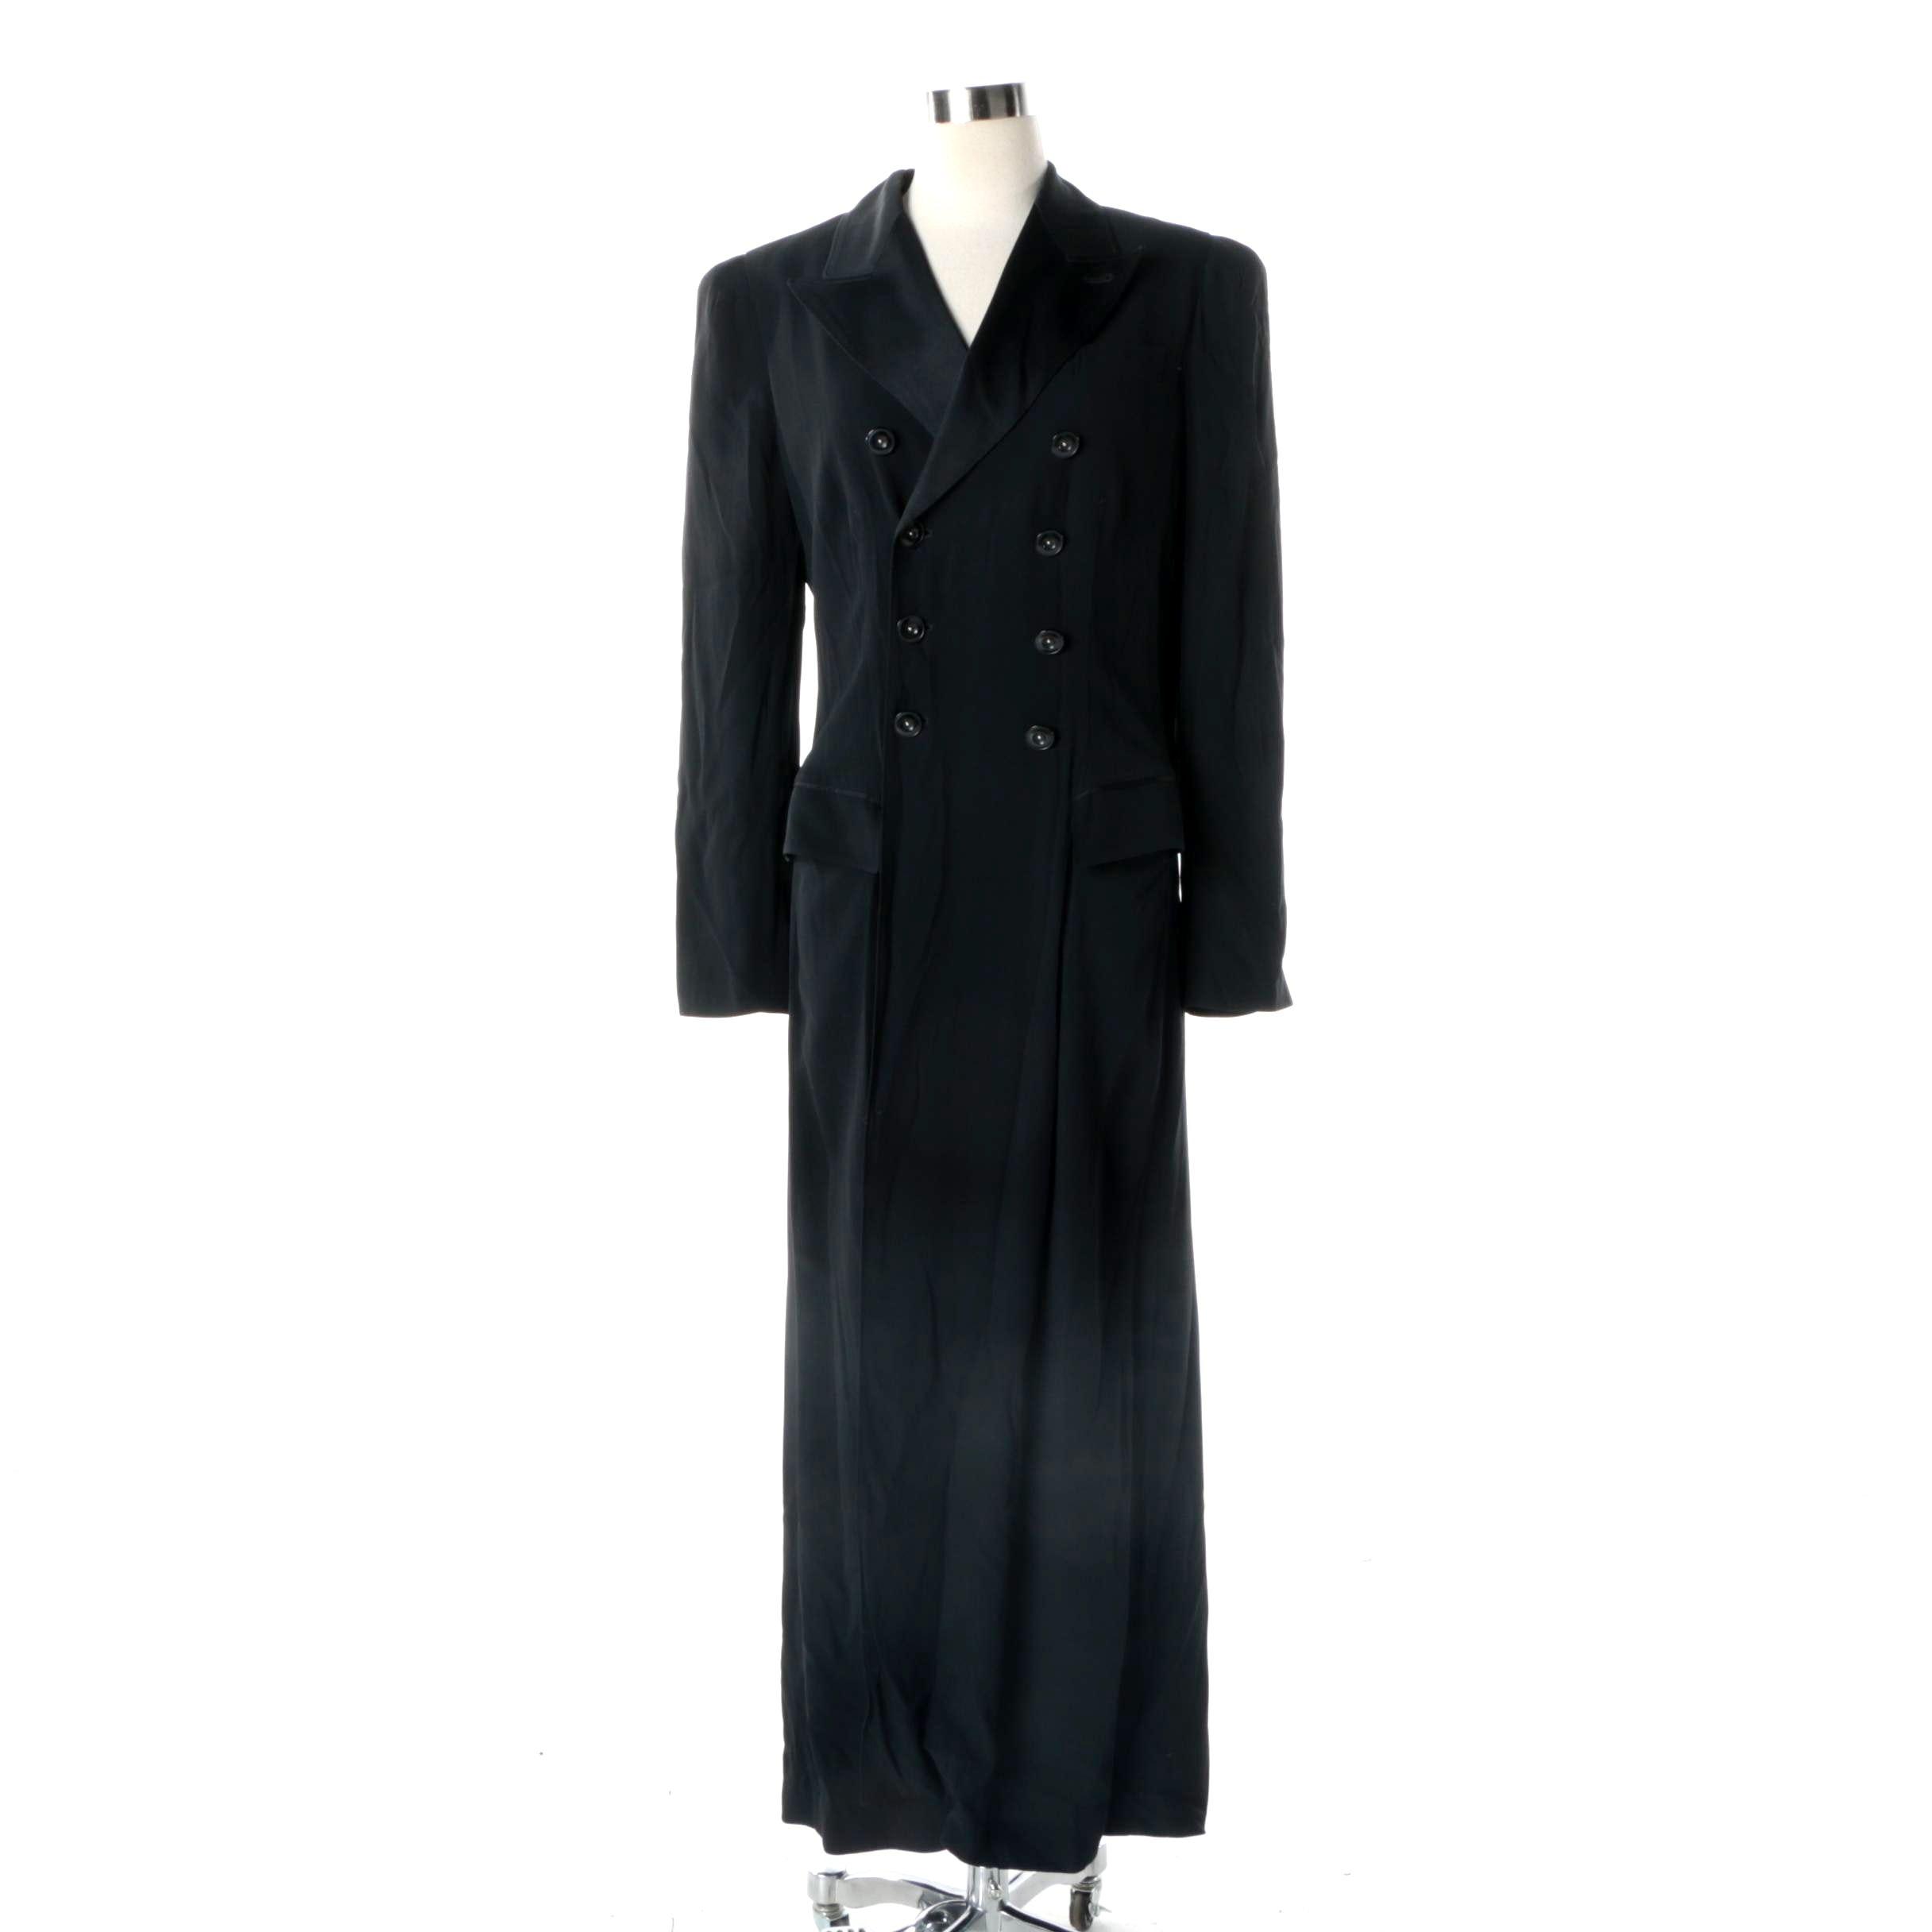 Jean Paul Gaultier Double-Breasted Black Coat